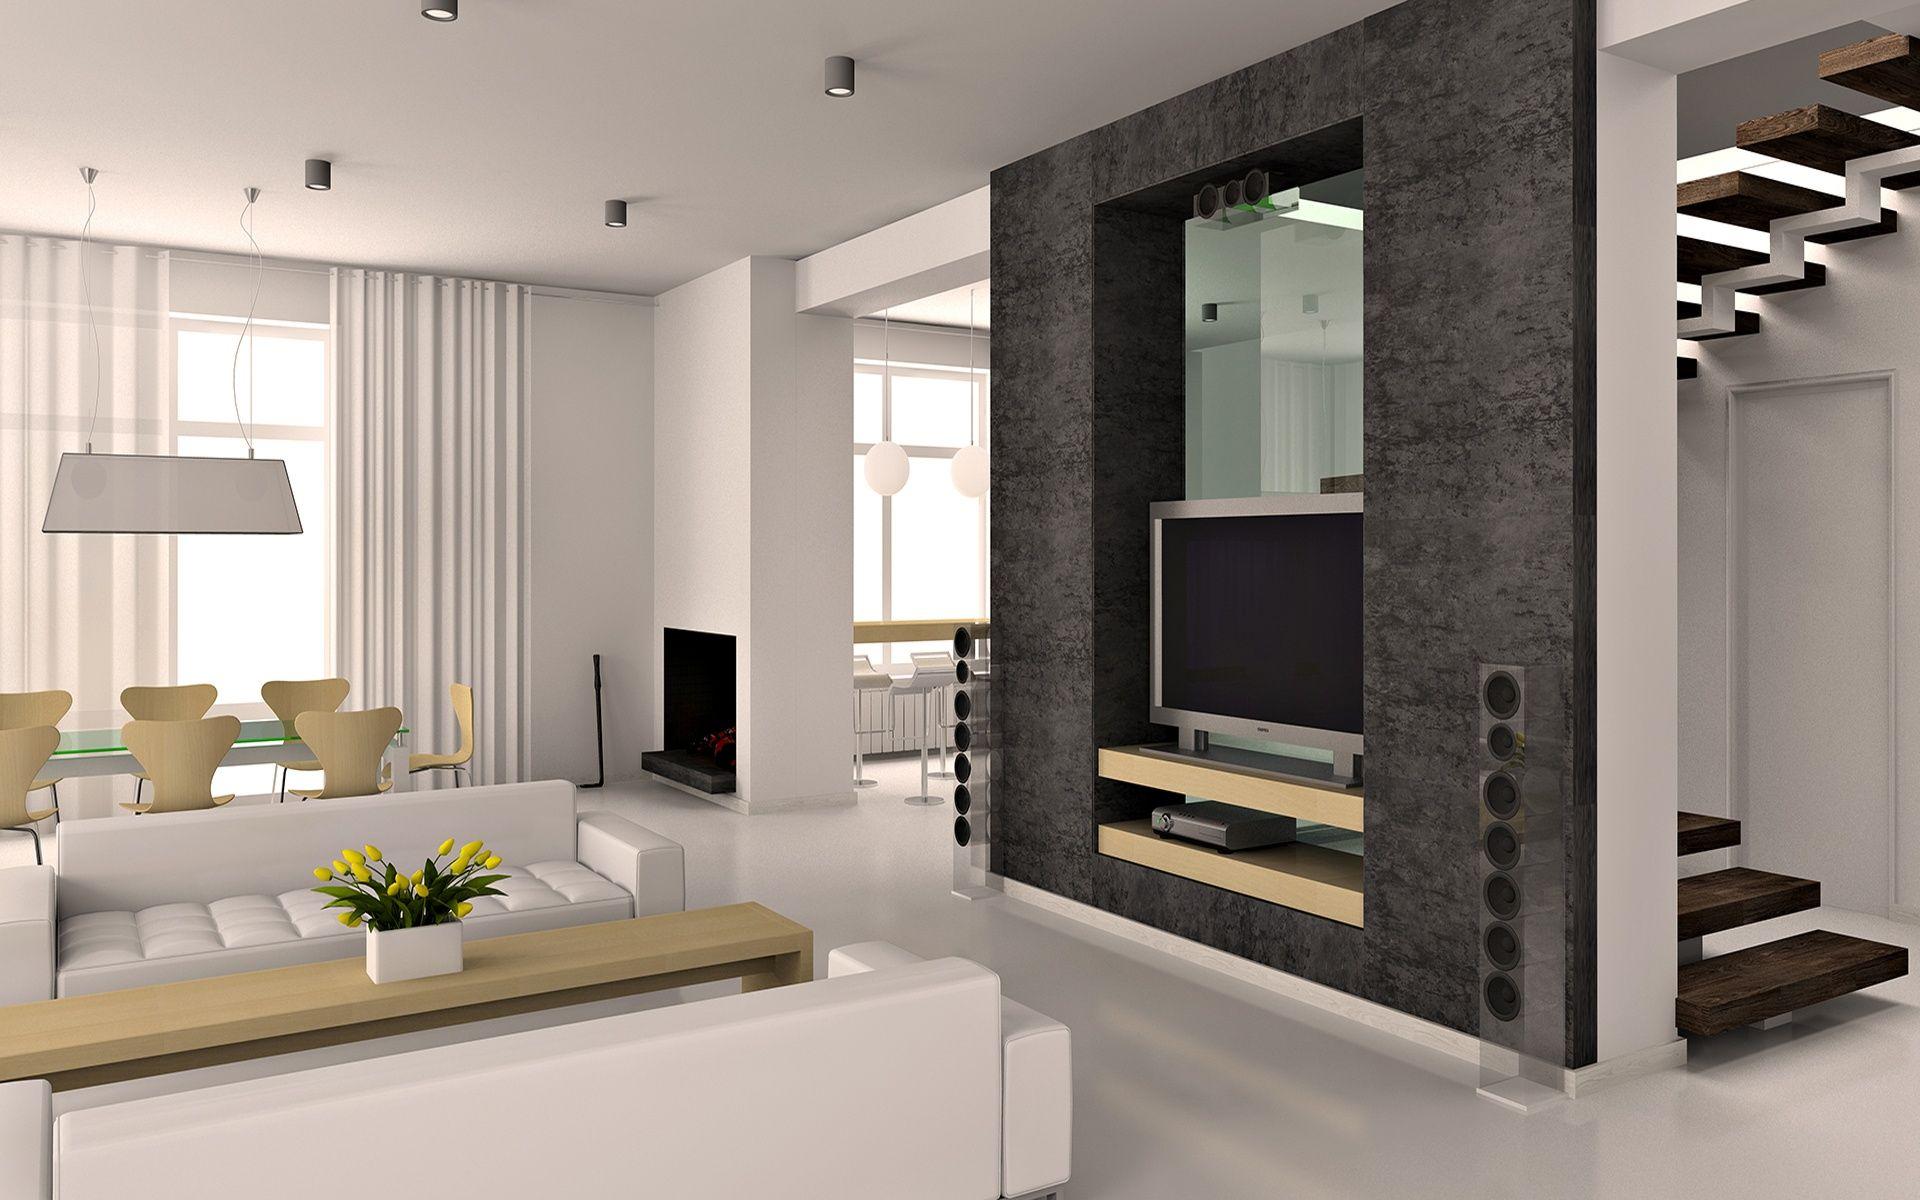 Interior Design UniqueFun Interior Decor Concepts 1920x1200